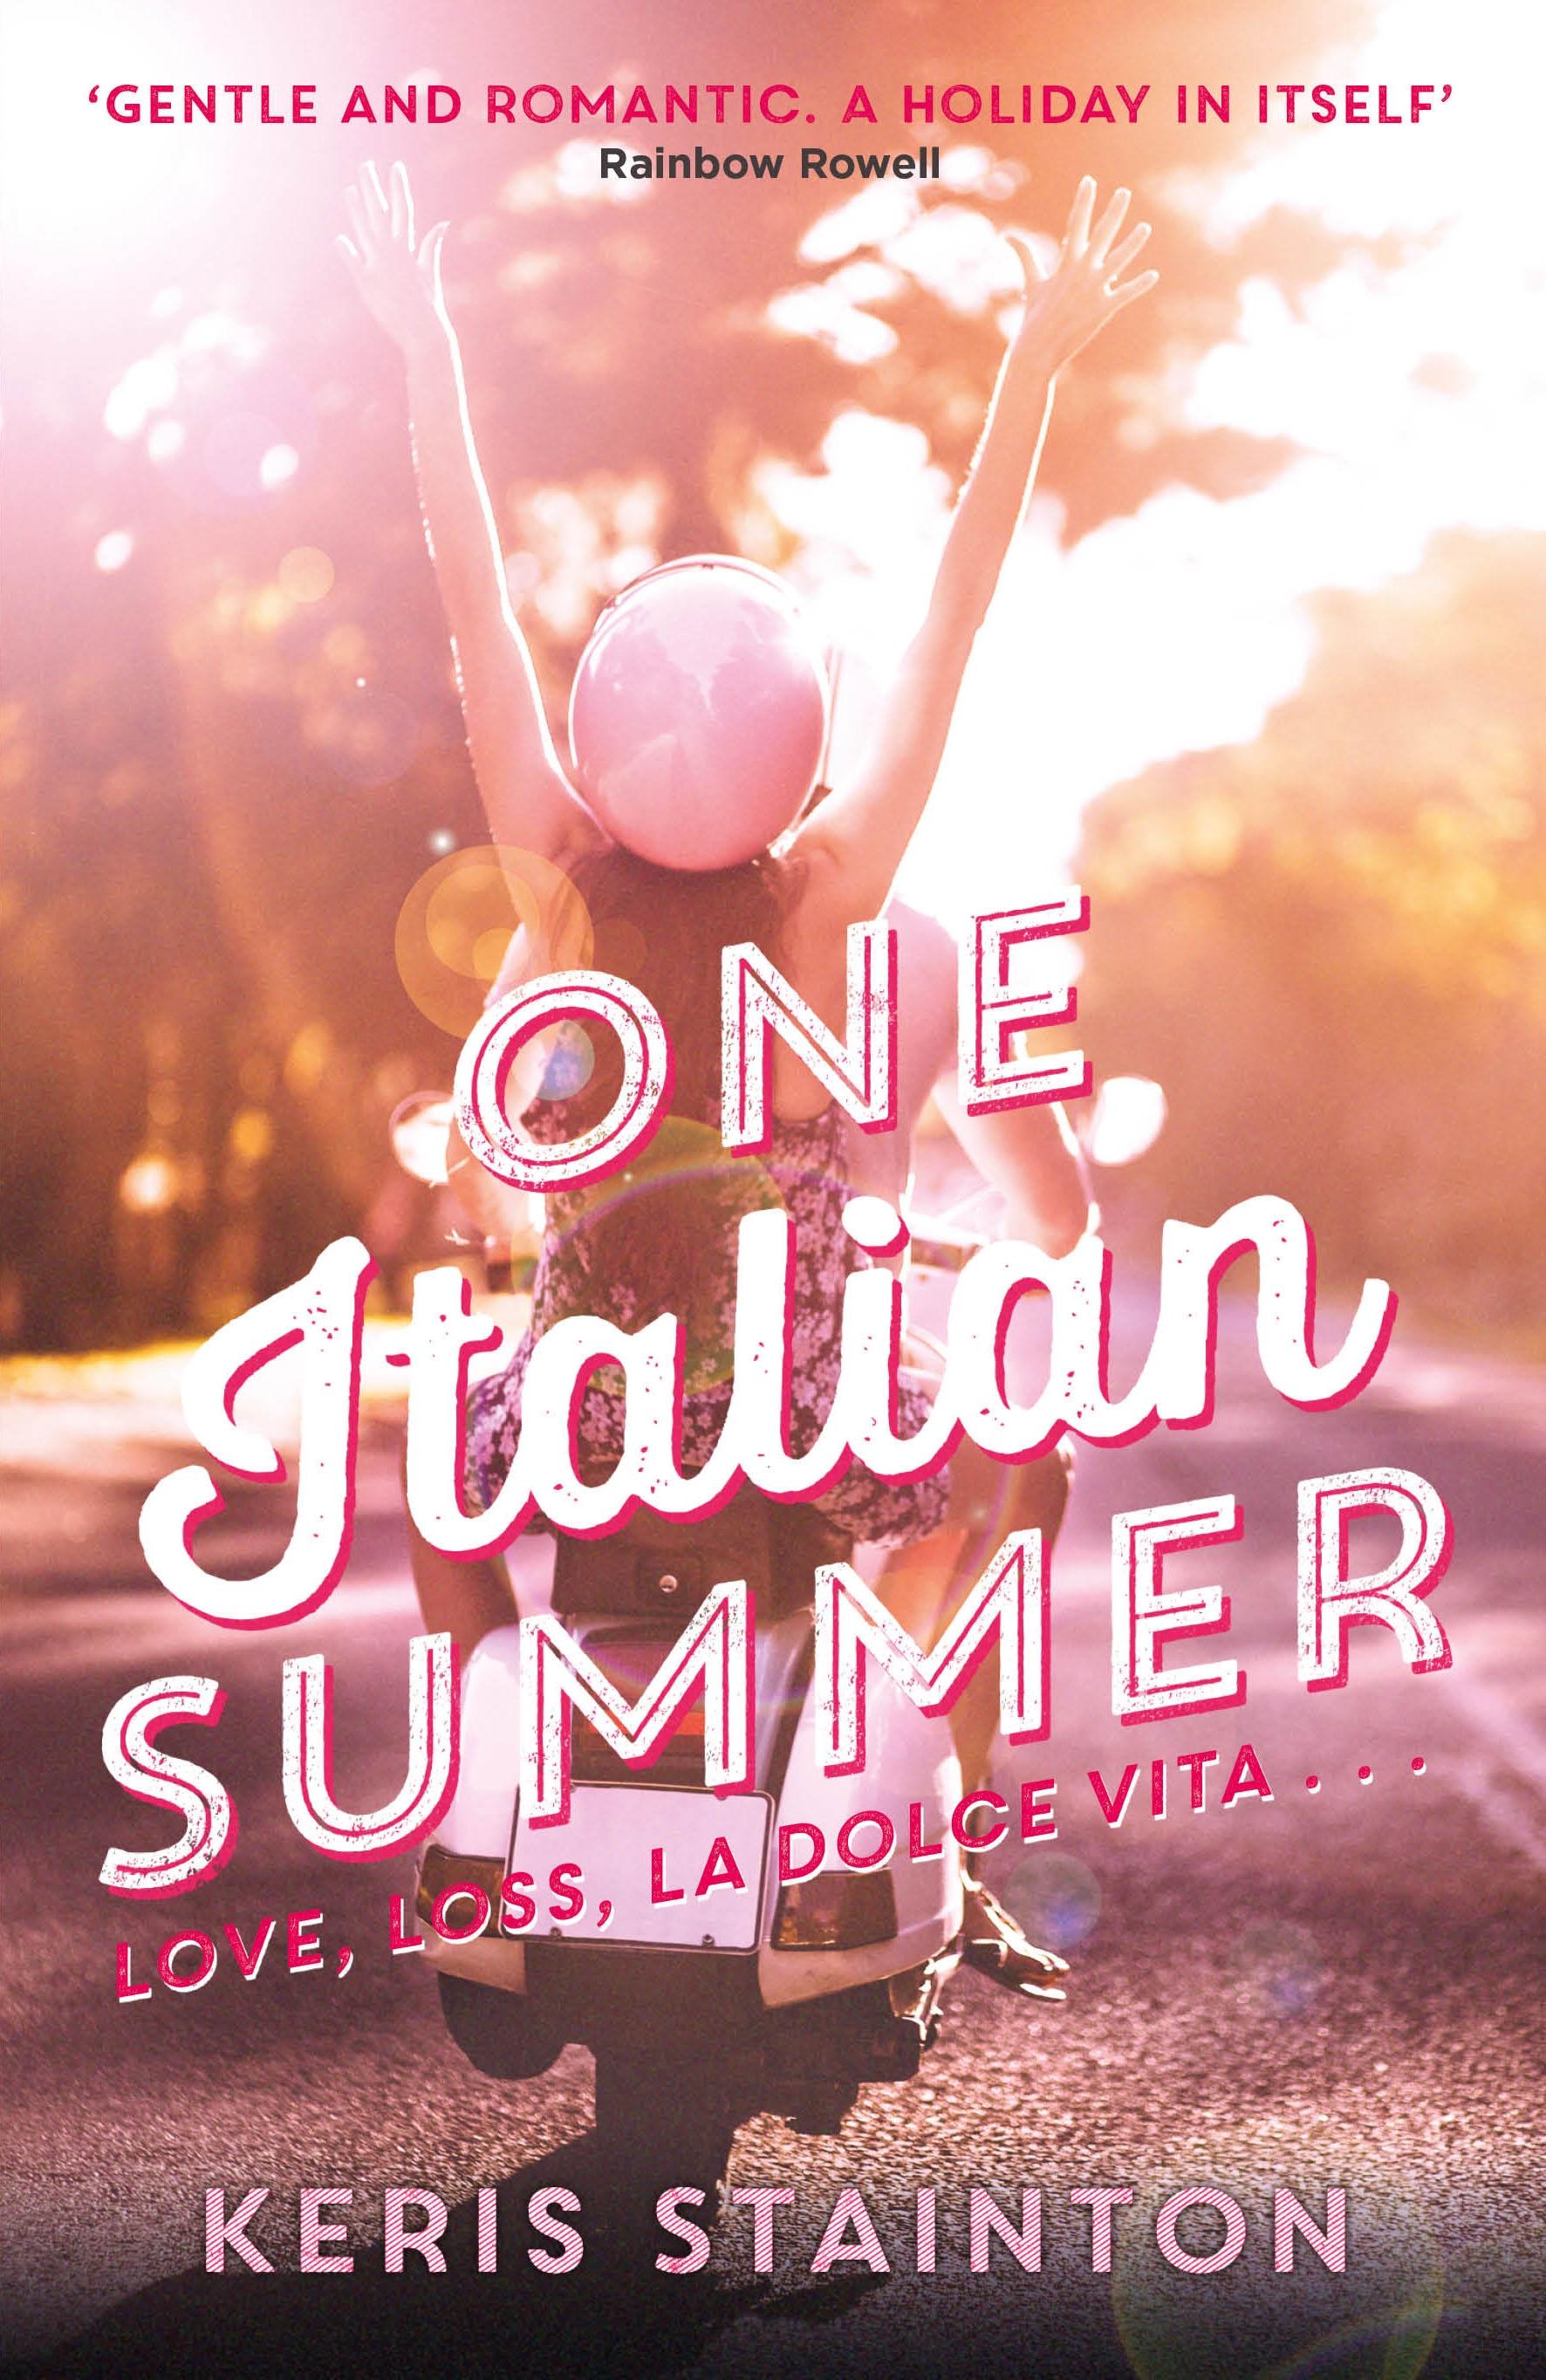 One Italian Summer by Keris Stainton